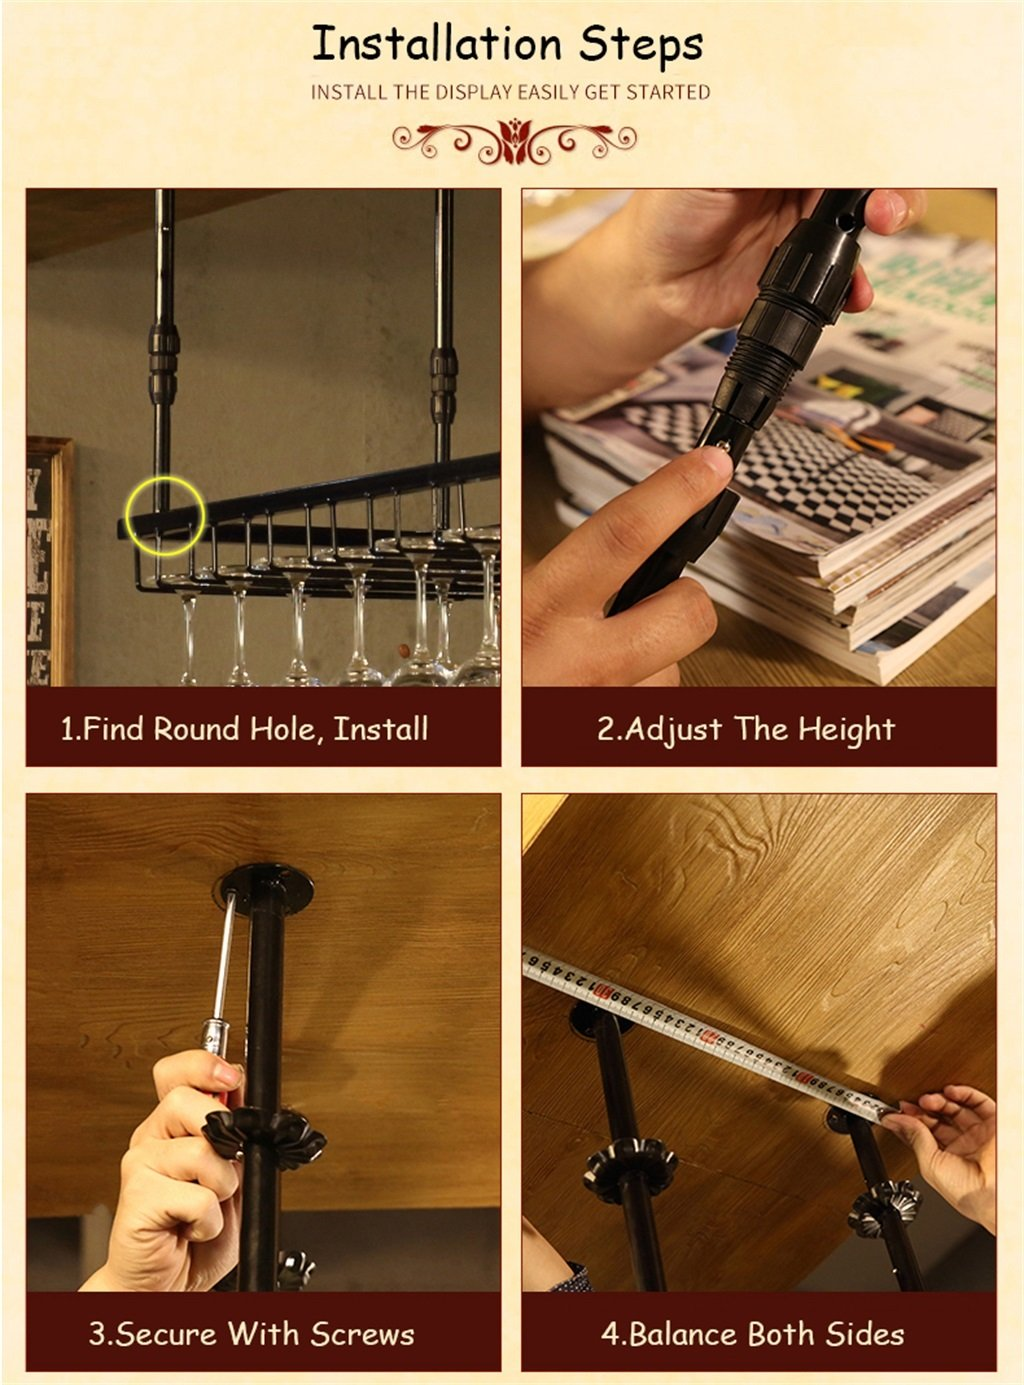 Yxsd Estantes para Vino Colgante Porta Botellas de Vino Metal Copa de Vino Estante Cerveza Stemware Racks Altura Ajustable Color : Negro, Tamaño : 80 * 35cm Utensilios de bar